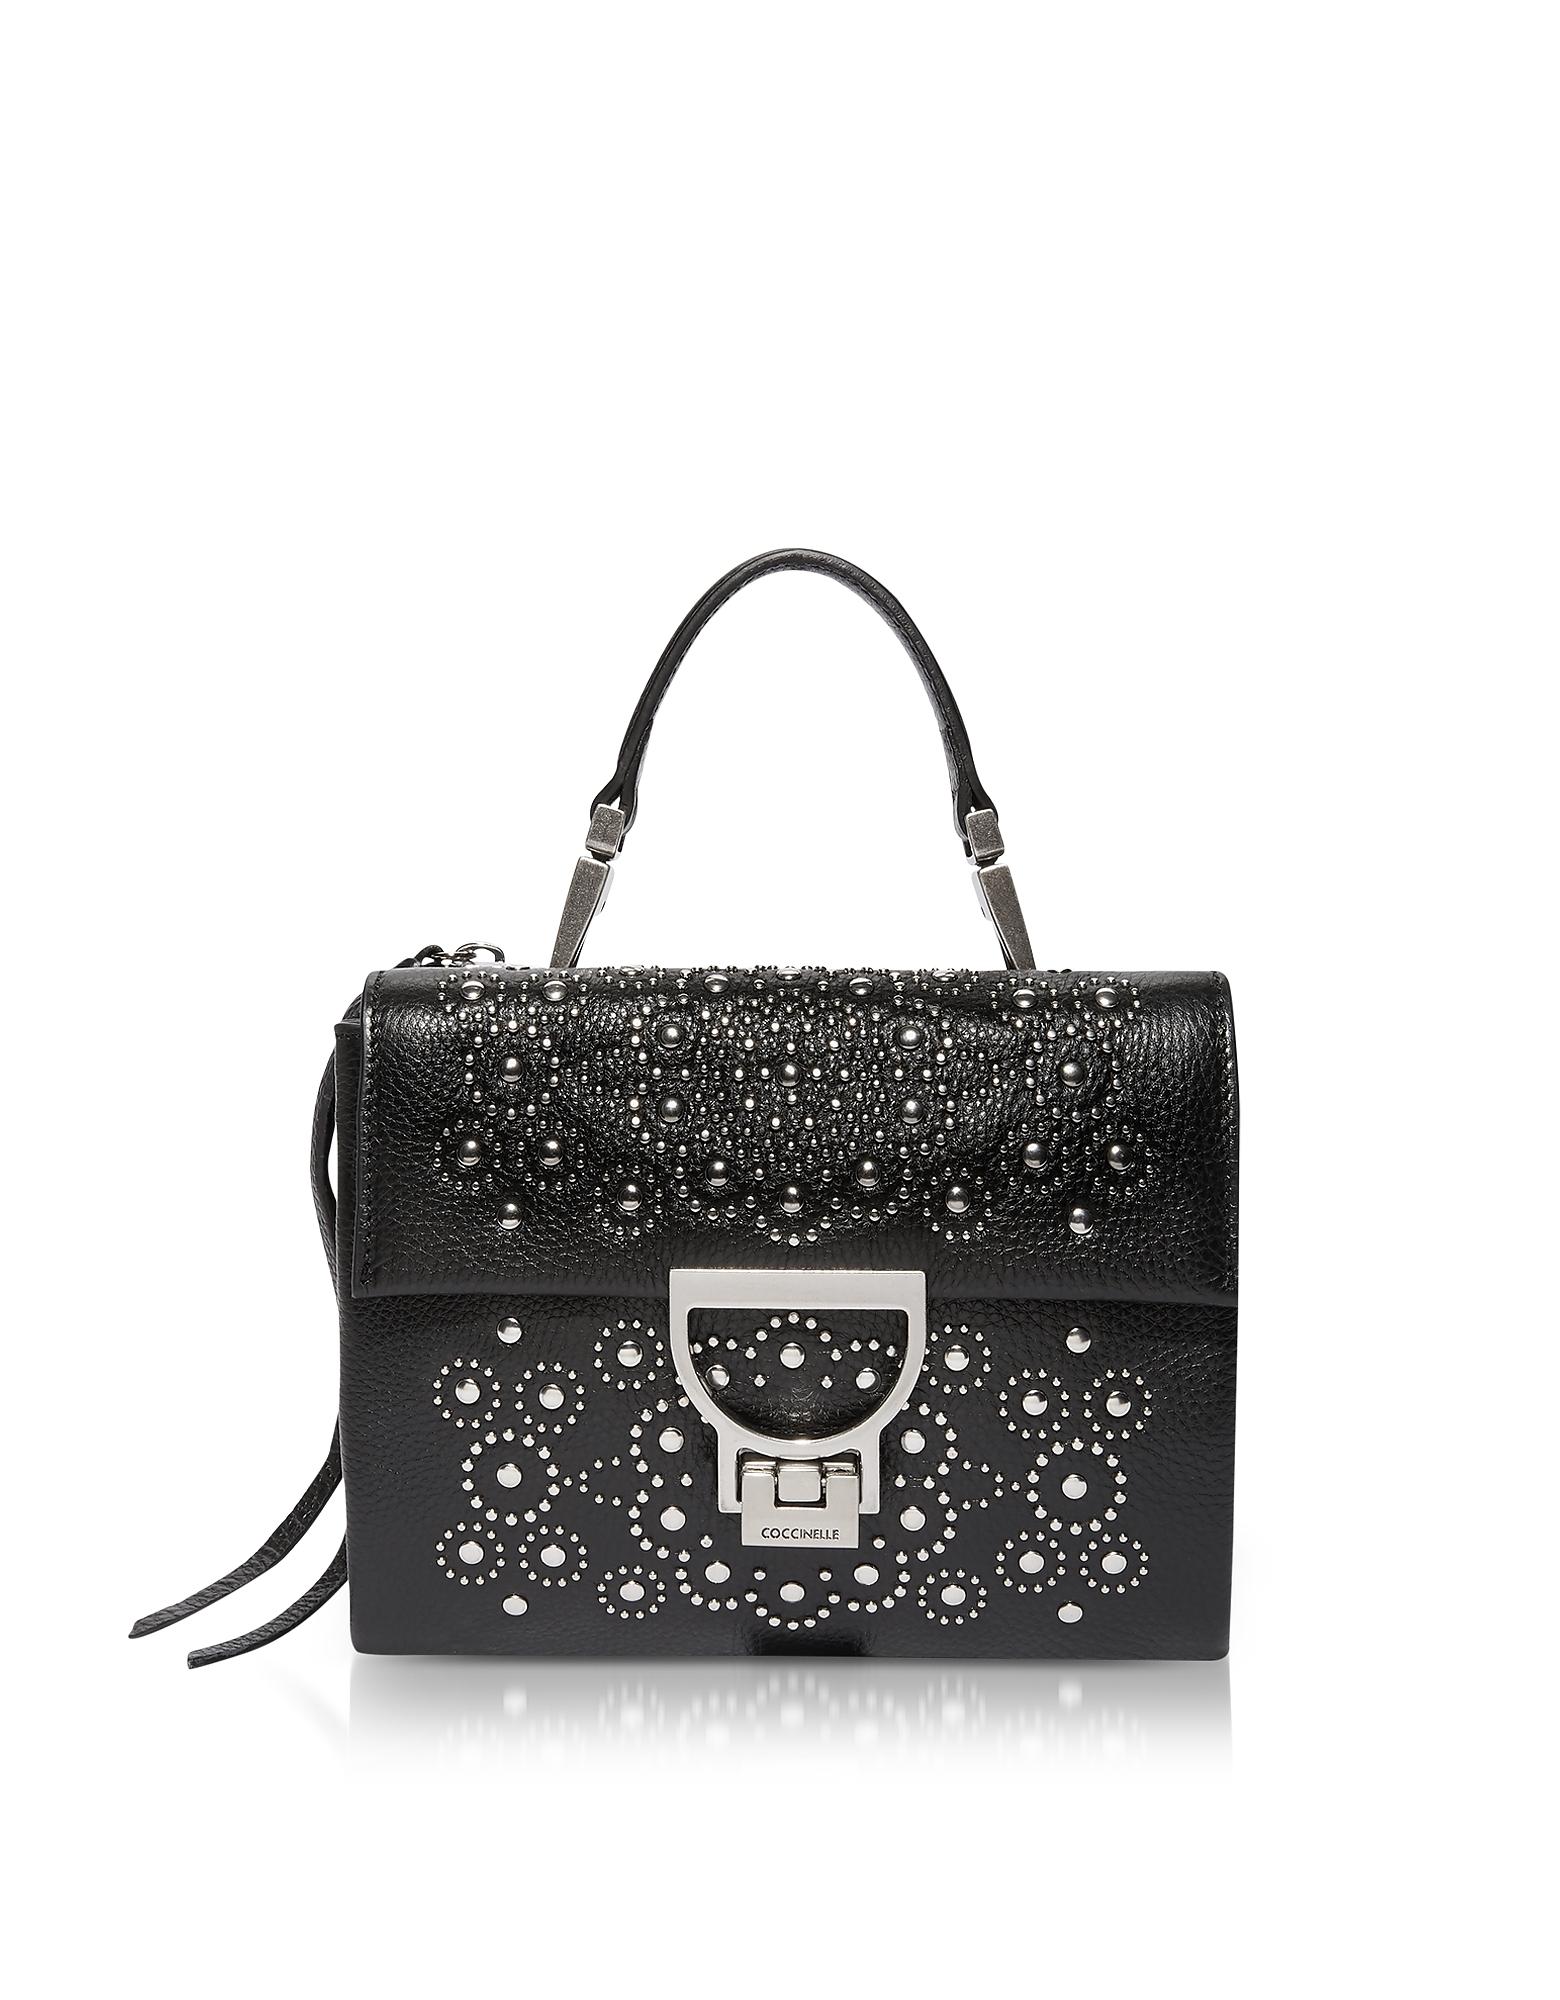 Coccinelle Handbags, Arlettis Studs Mini Bag w/Shoulder Strap